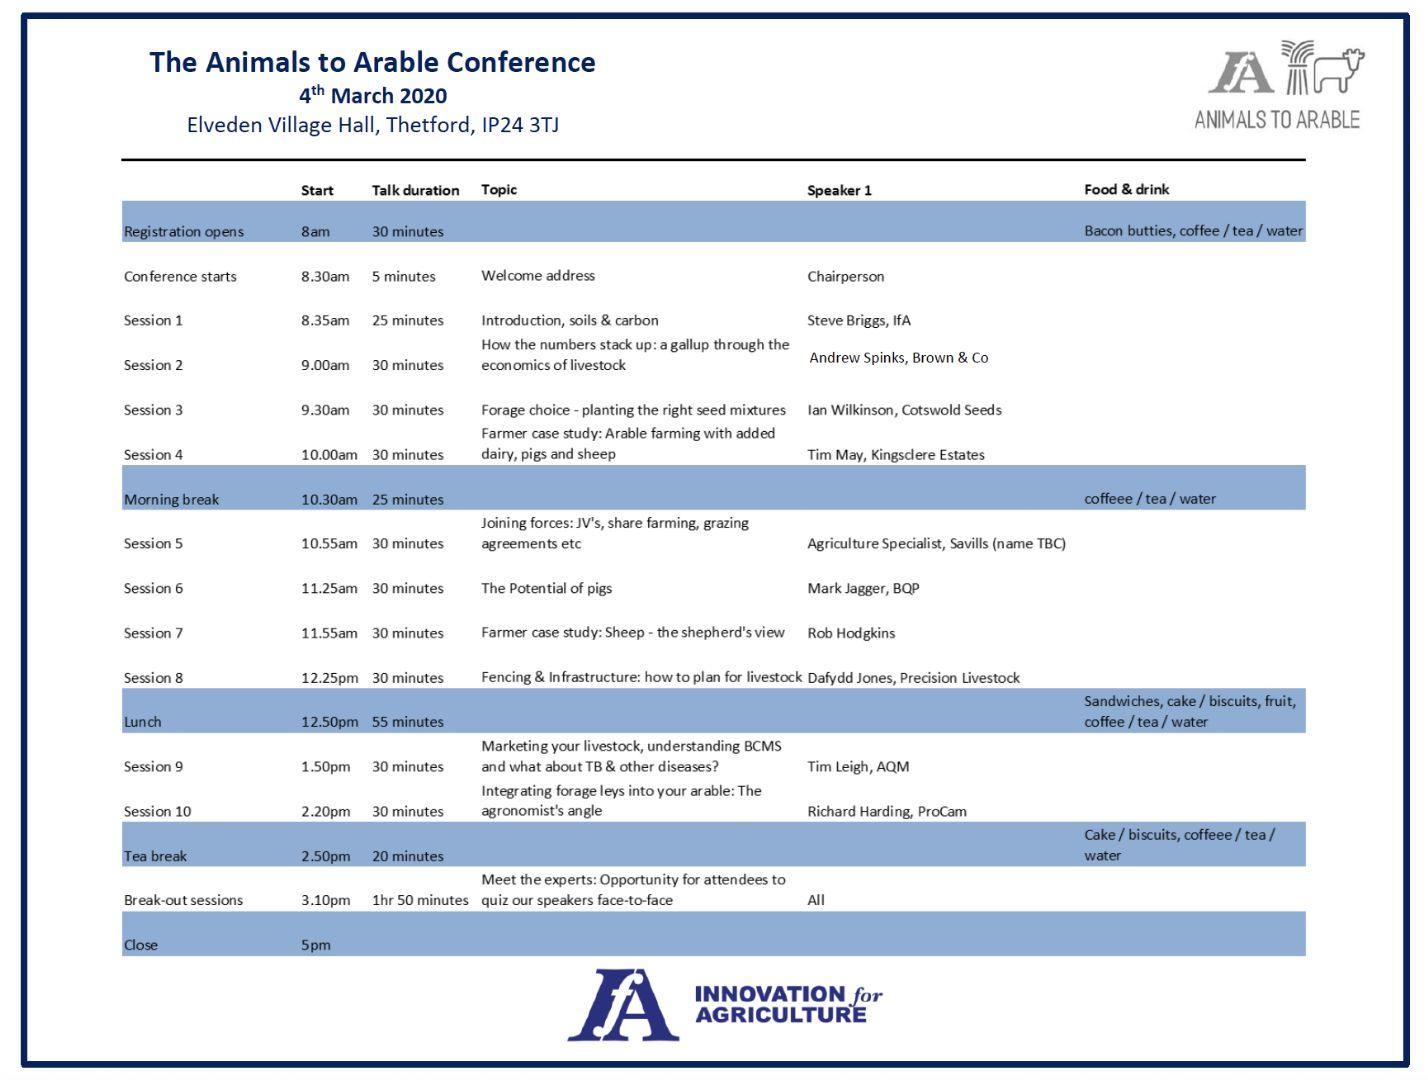 Animals to Arable Agenda